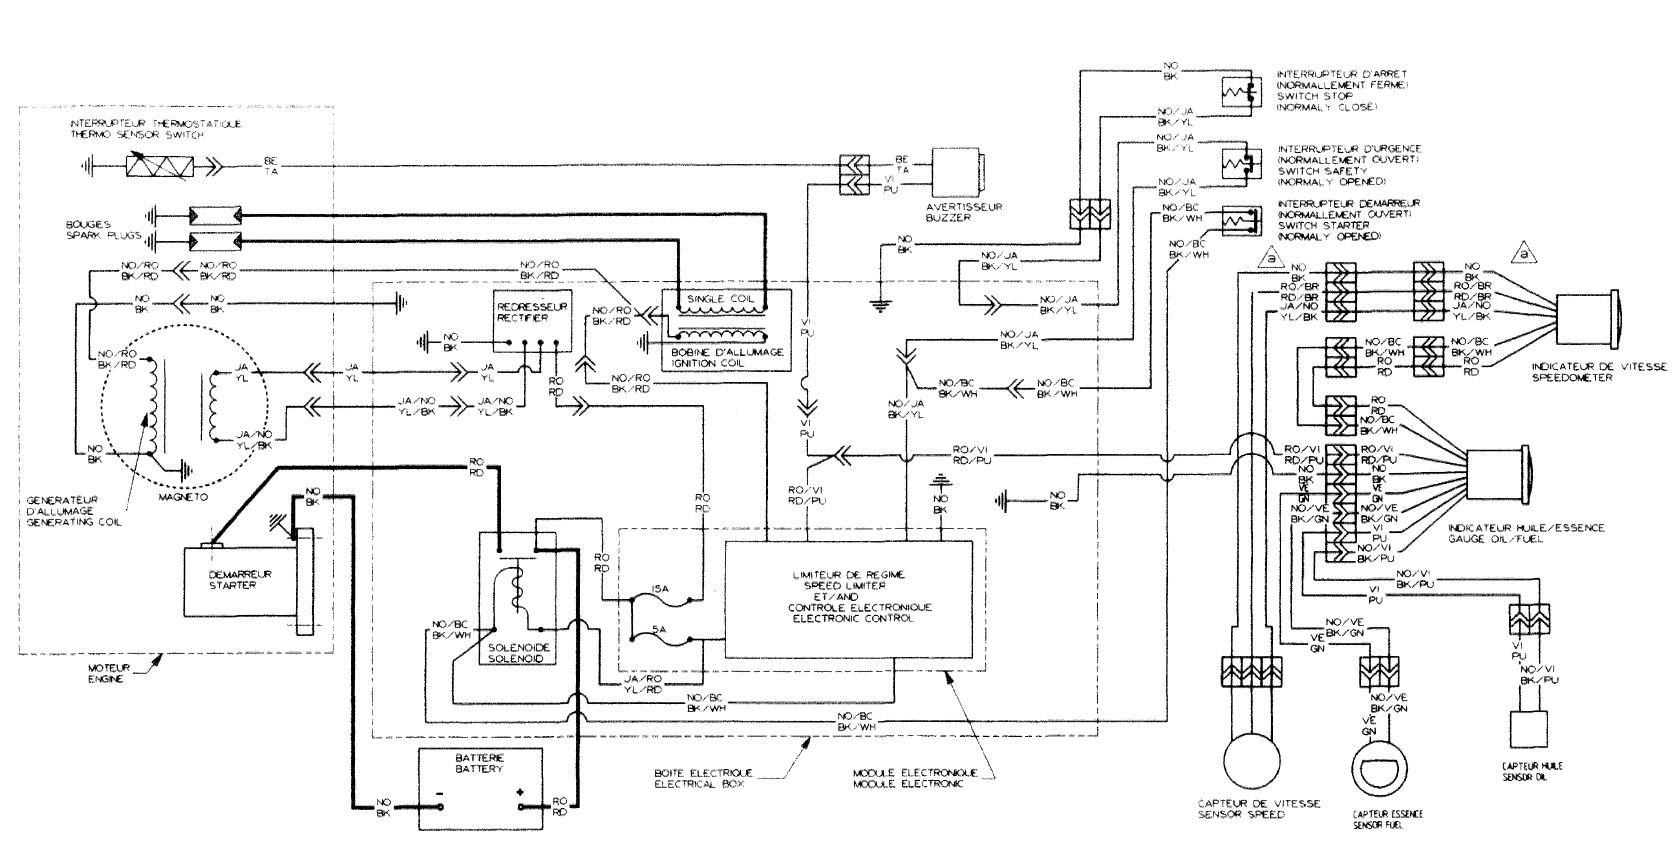 Diagram Plymouth Gtx Wiring Diagram Full Version Hd Quality Wiring Diagram Rigidignitewiring1 Itcmolari It